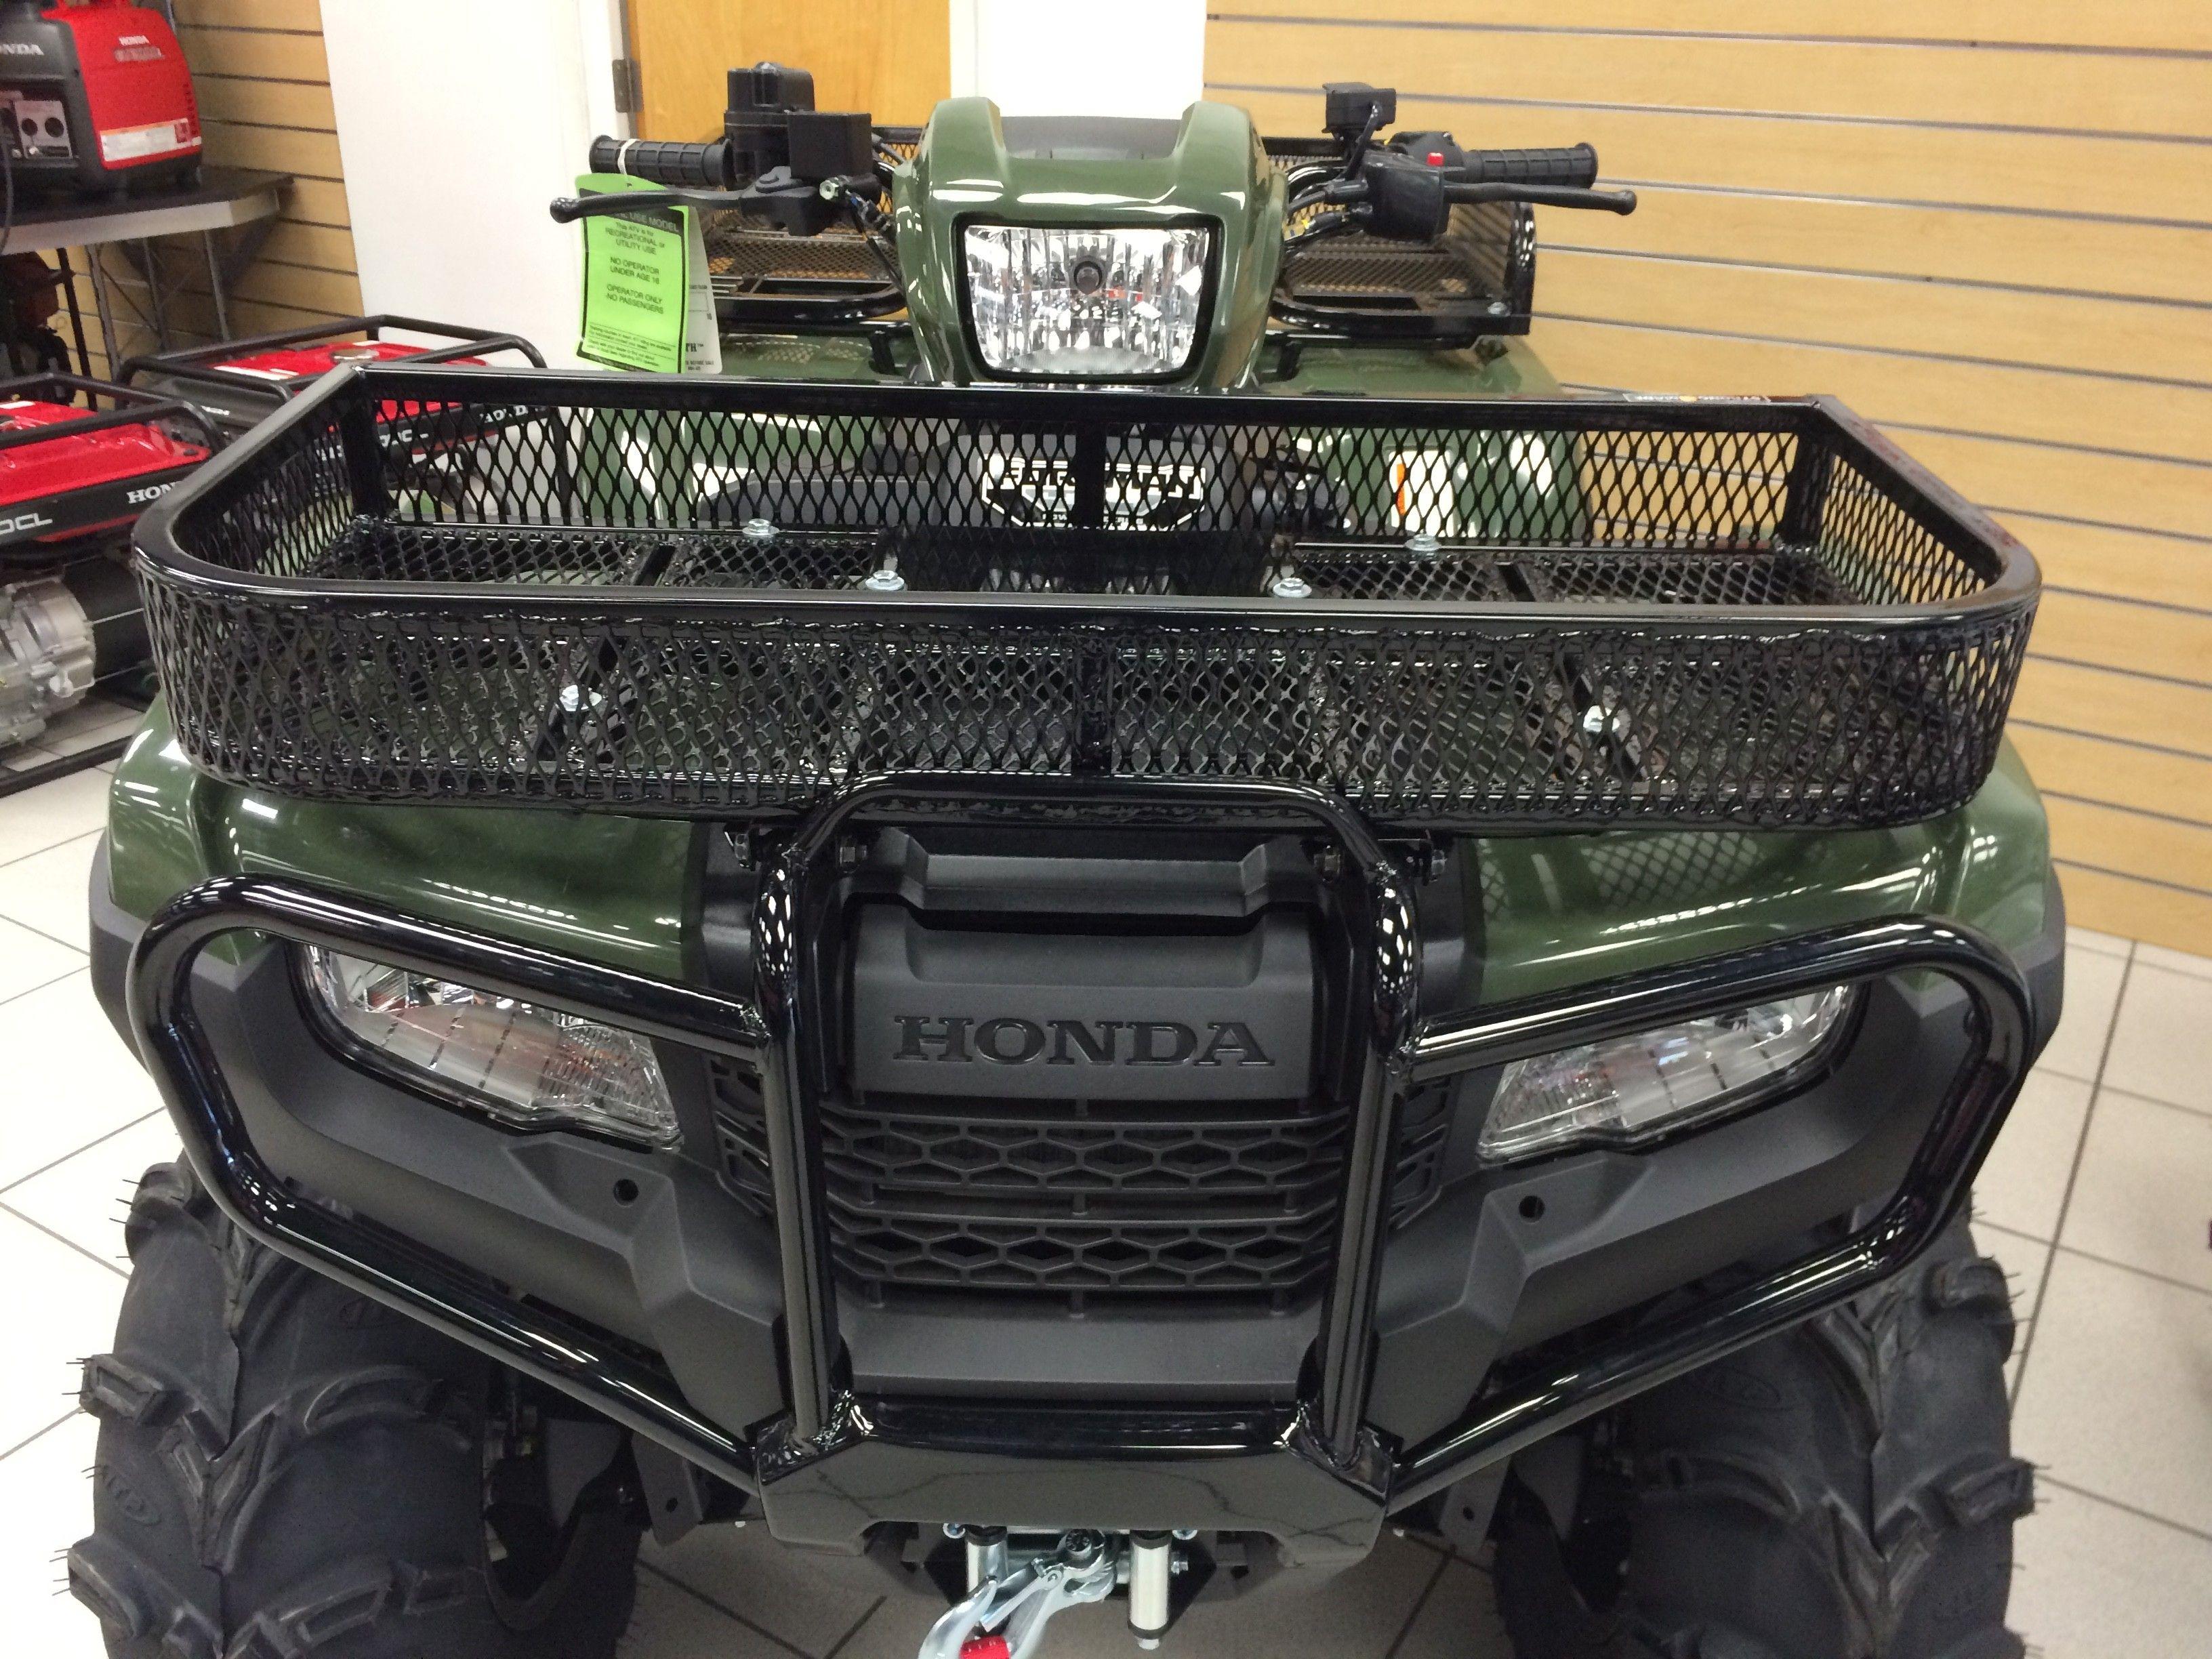 249 Front Rack For Honda Foreman Rancher 2014 2019 Rubicon